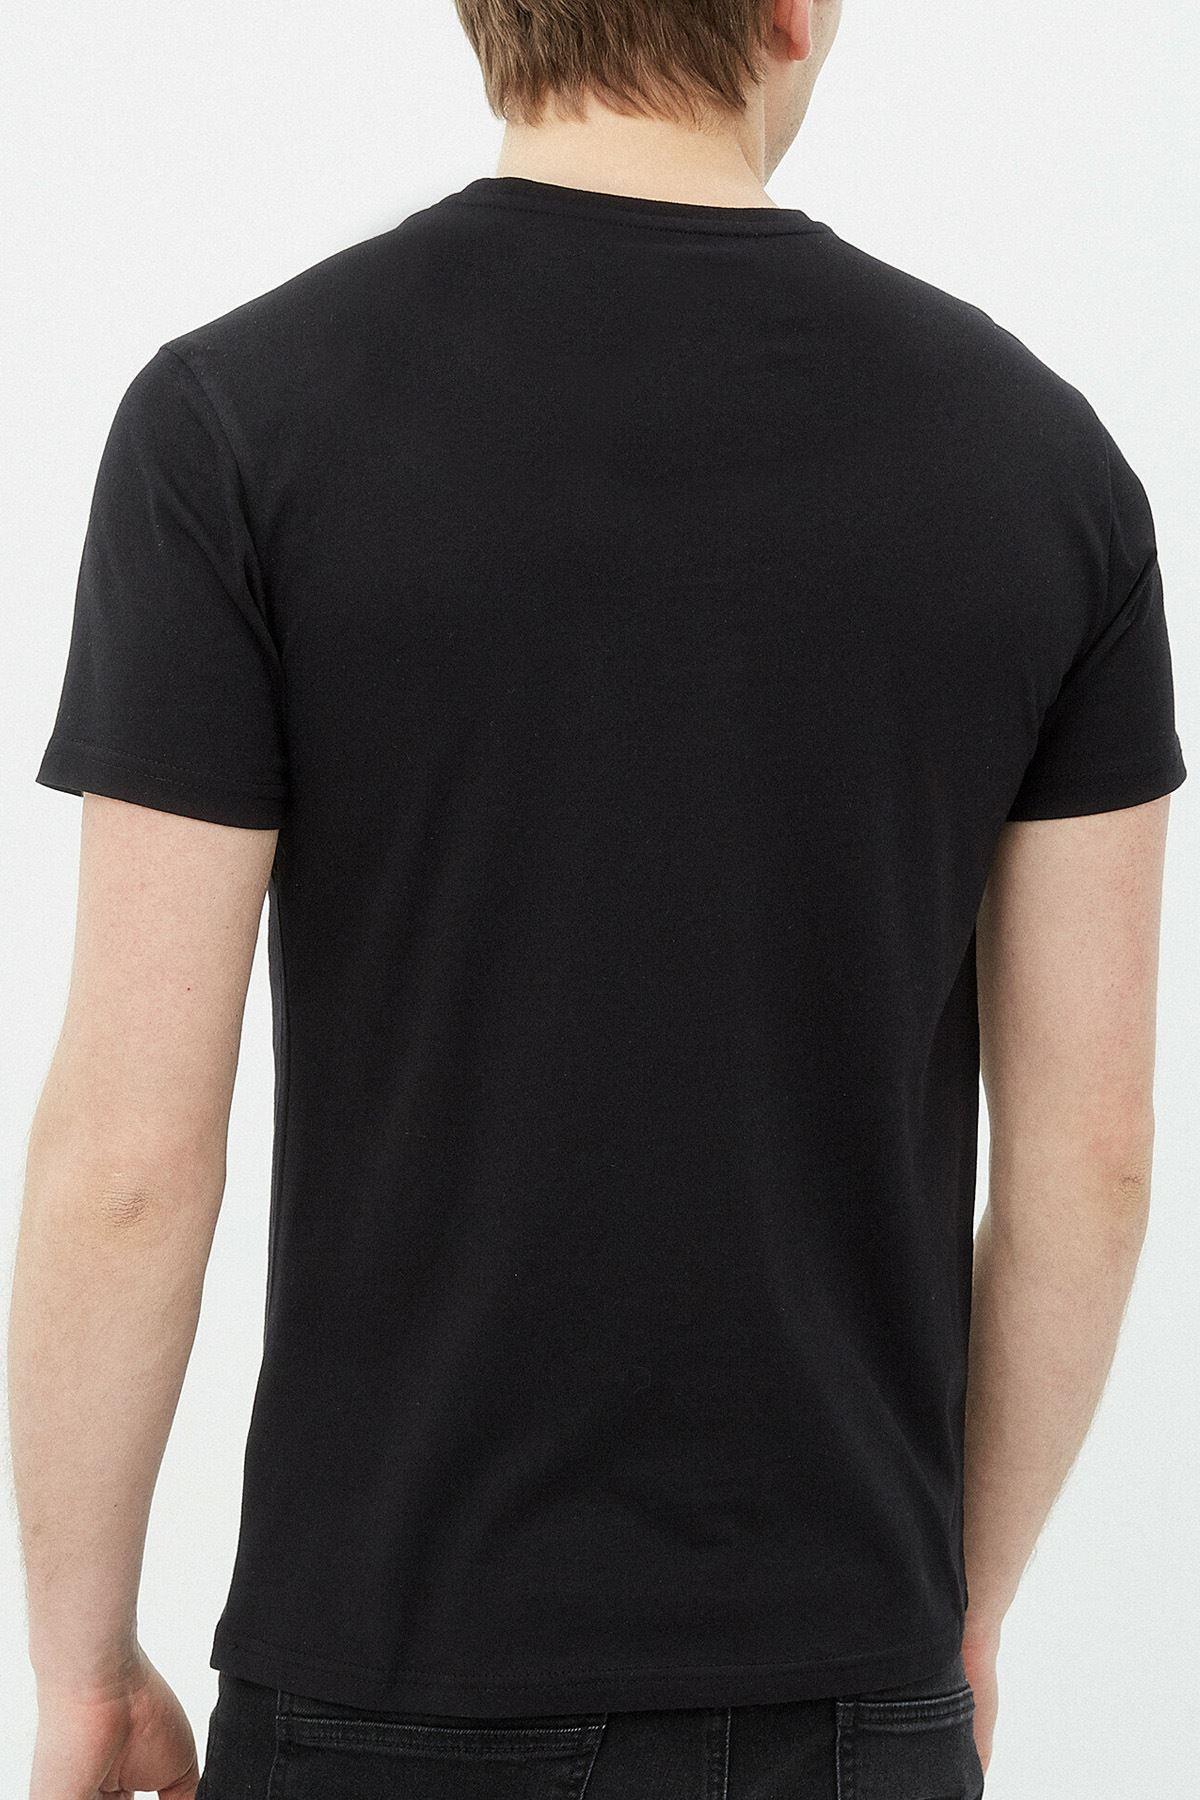 Naruto Anime 06 Siyah Erkek Tshirt - Tişört